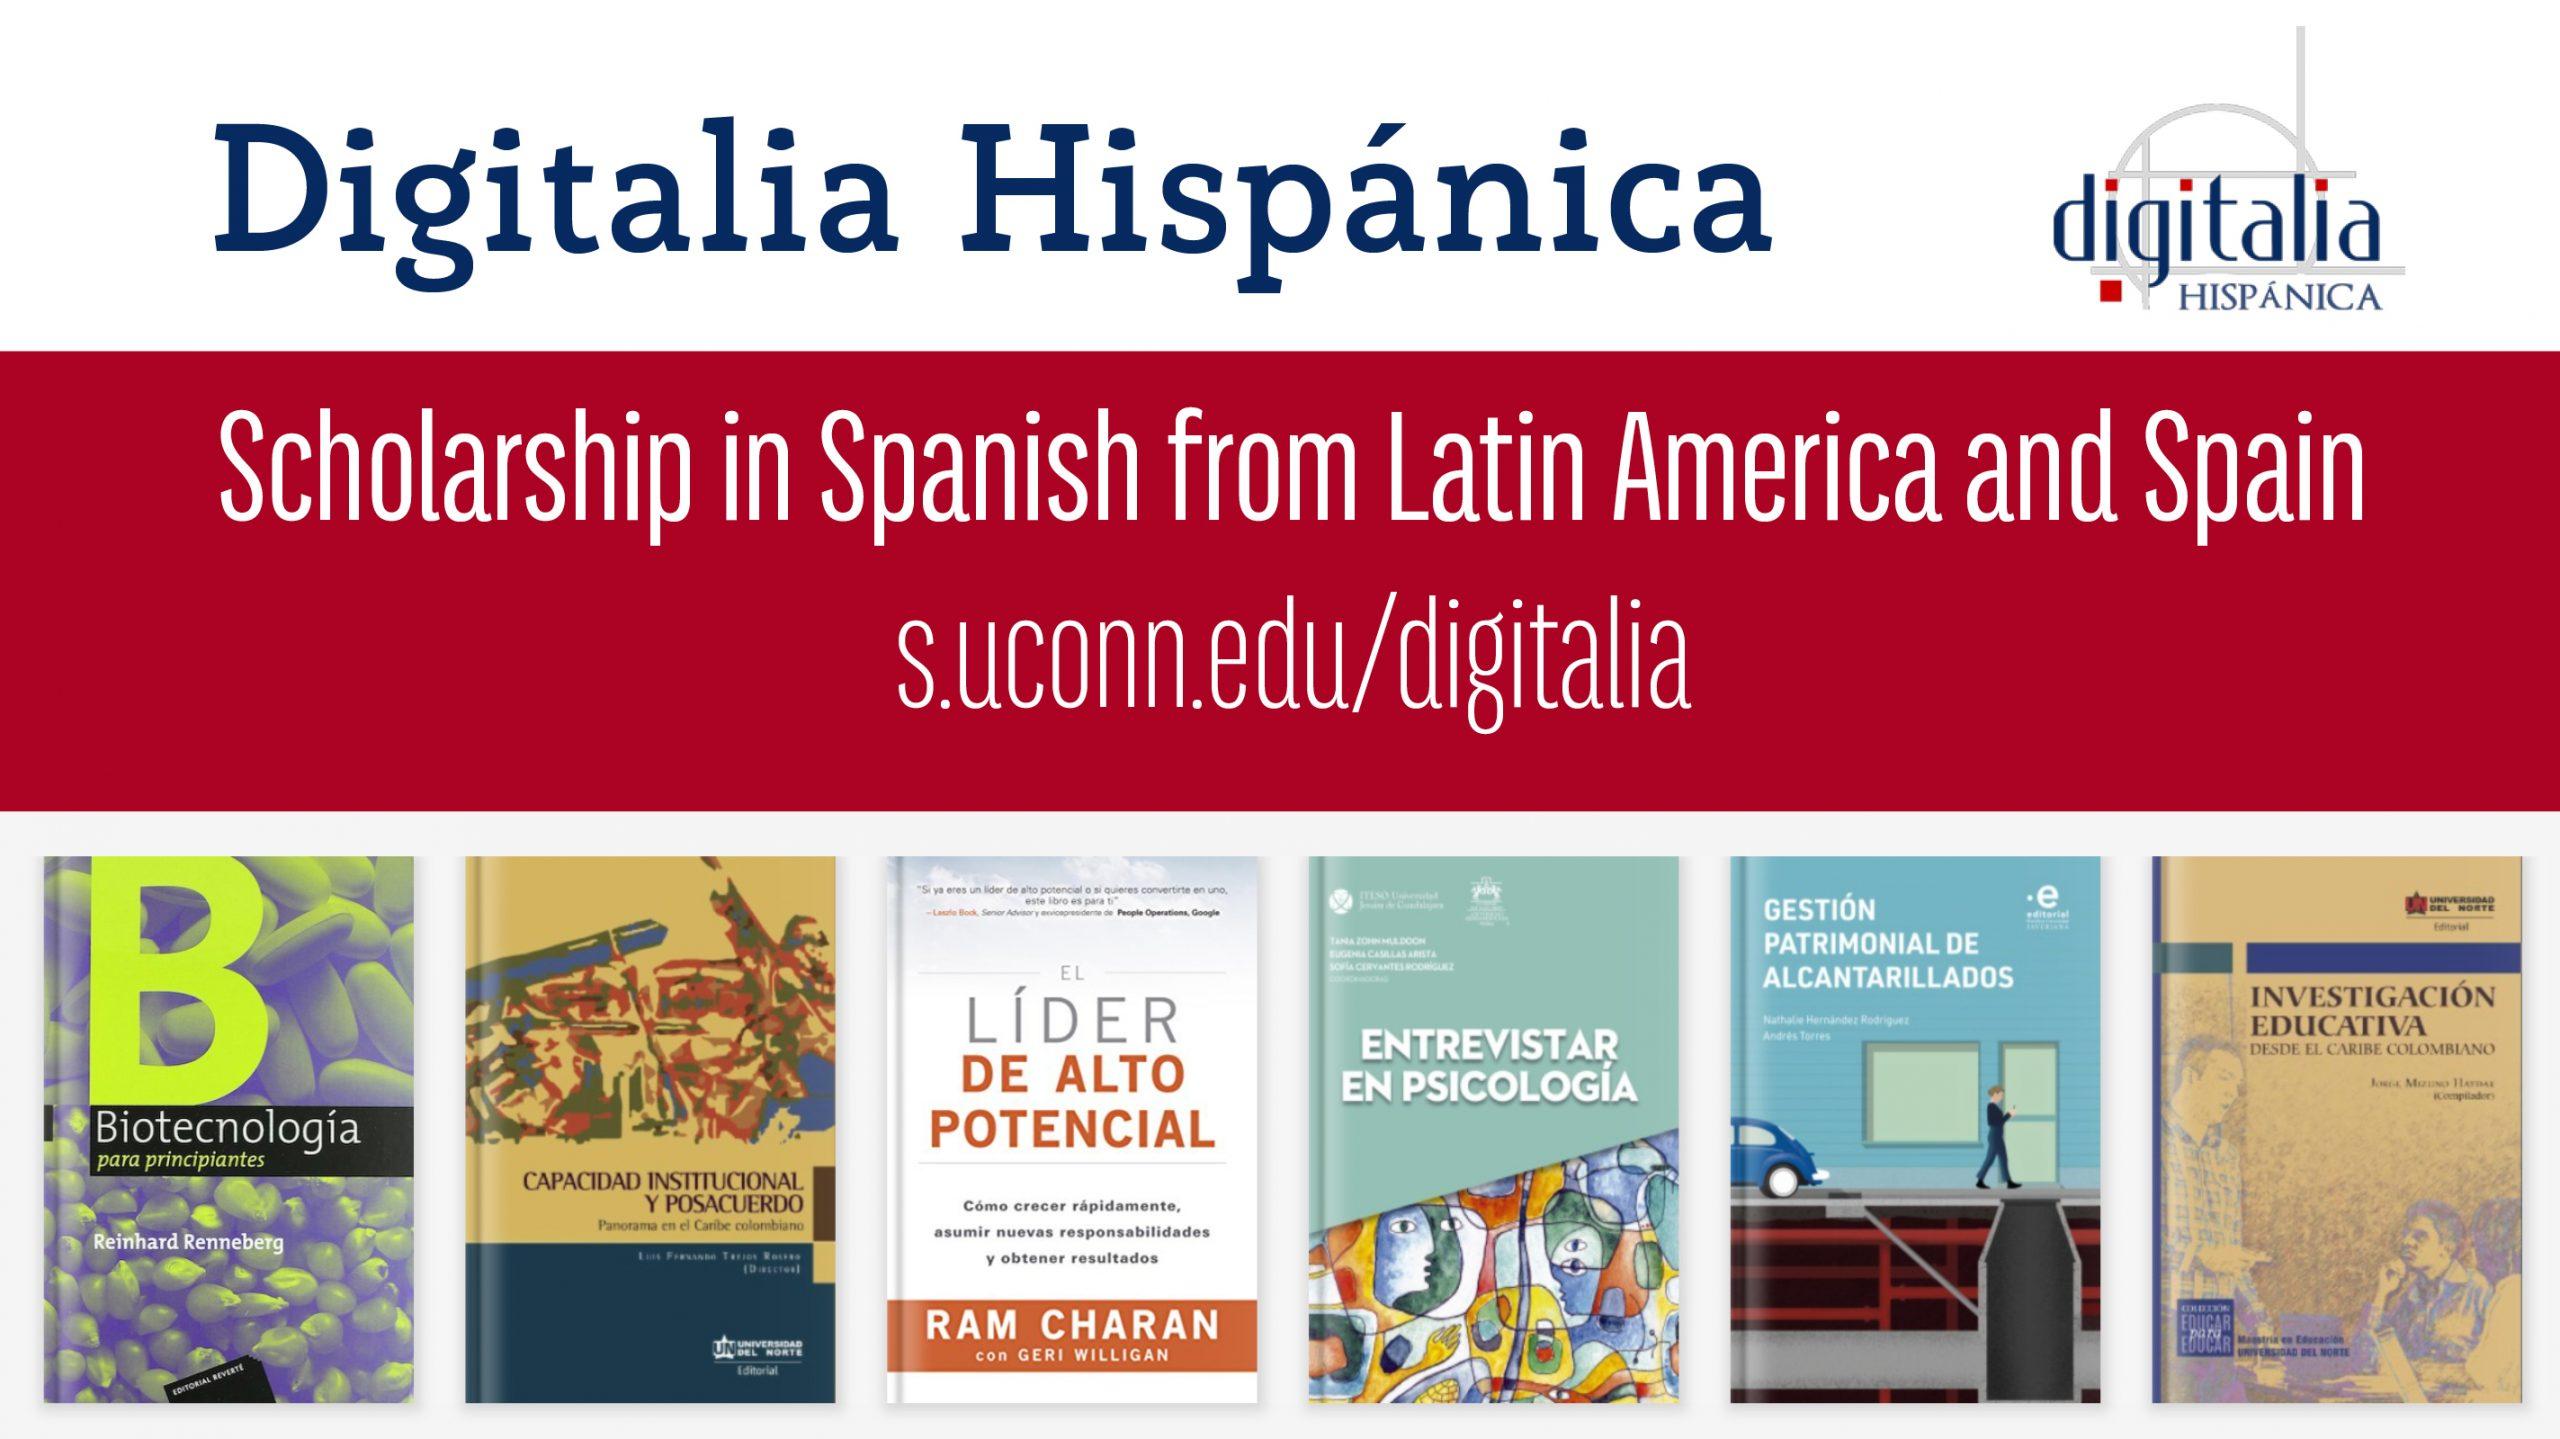 Digitalia Hispánica, Scholarship in Spanish from Latin America and Spain s.uconn.edu/digitalia